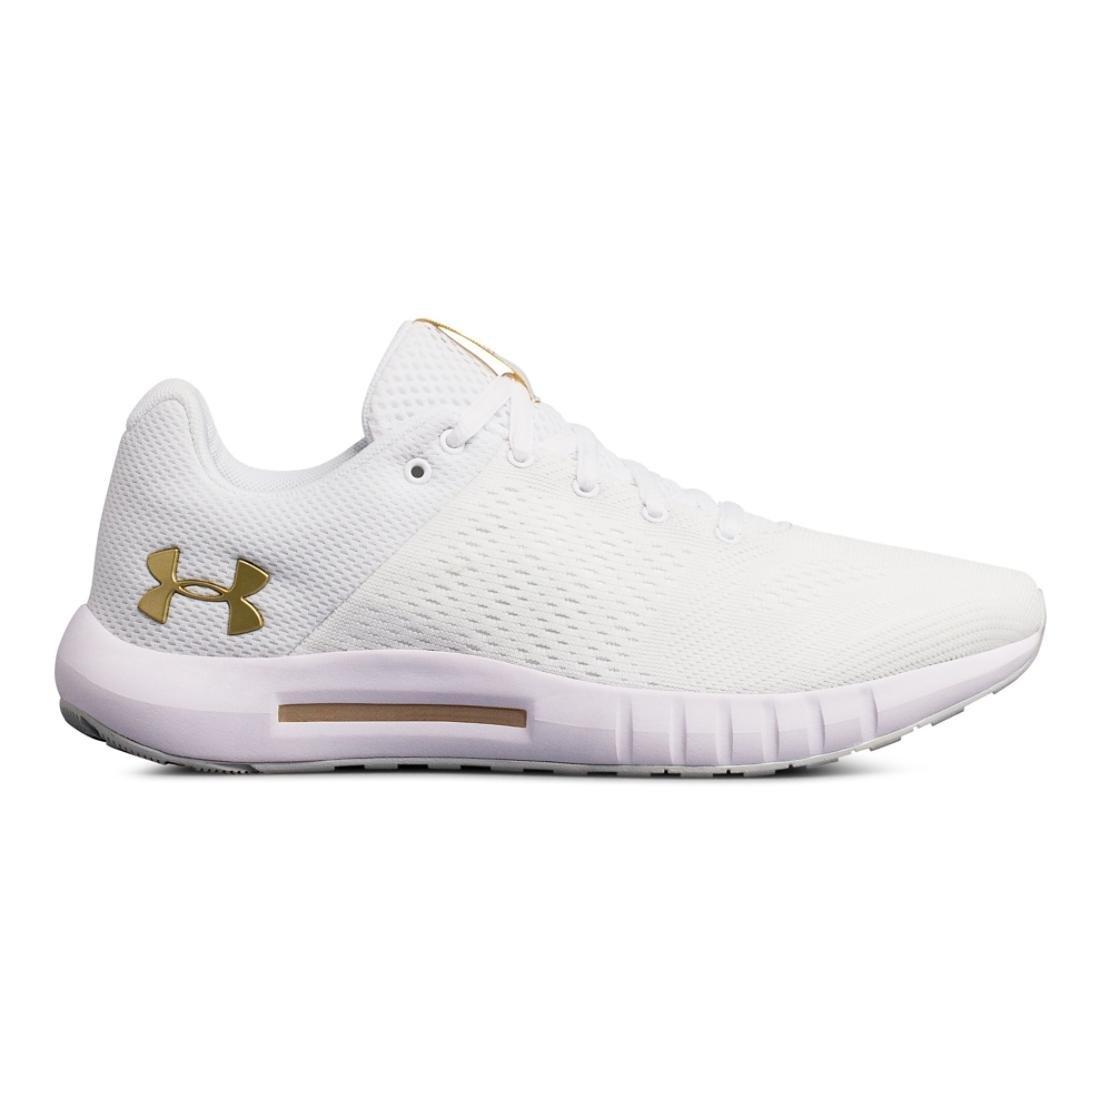 Under Armour Women's Micro G Pursuit Sneaker B075MPLXGS 7.5 B(M) US|White/Elemental/Metallic Gold